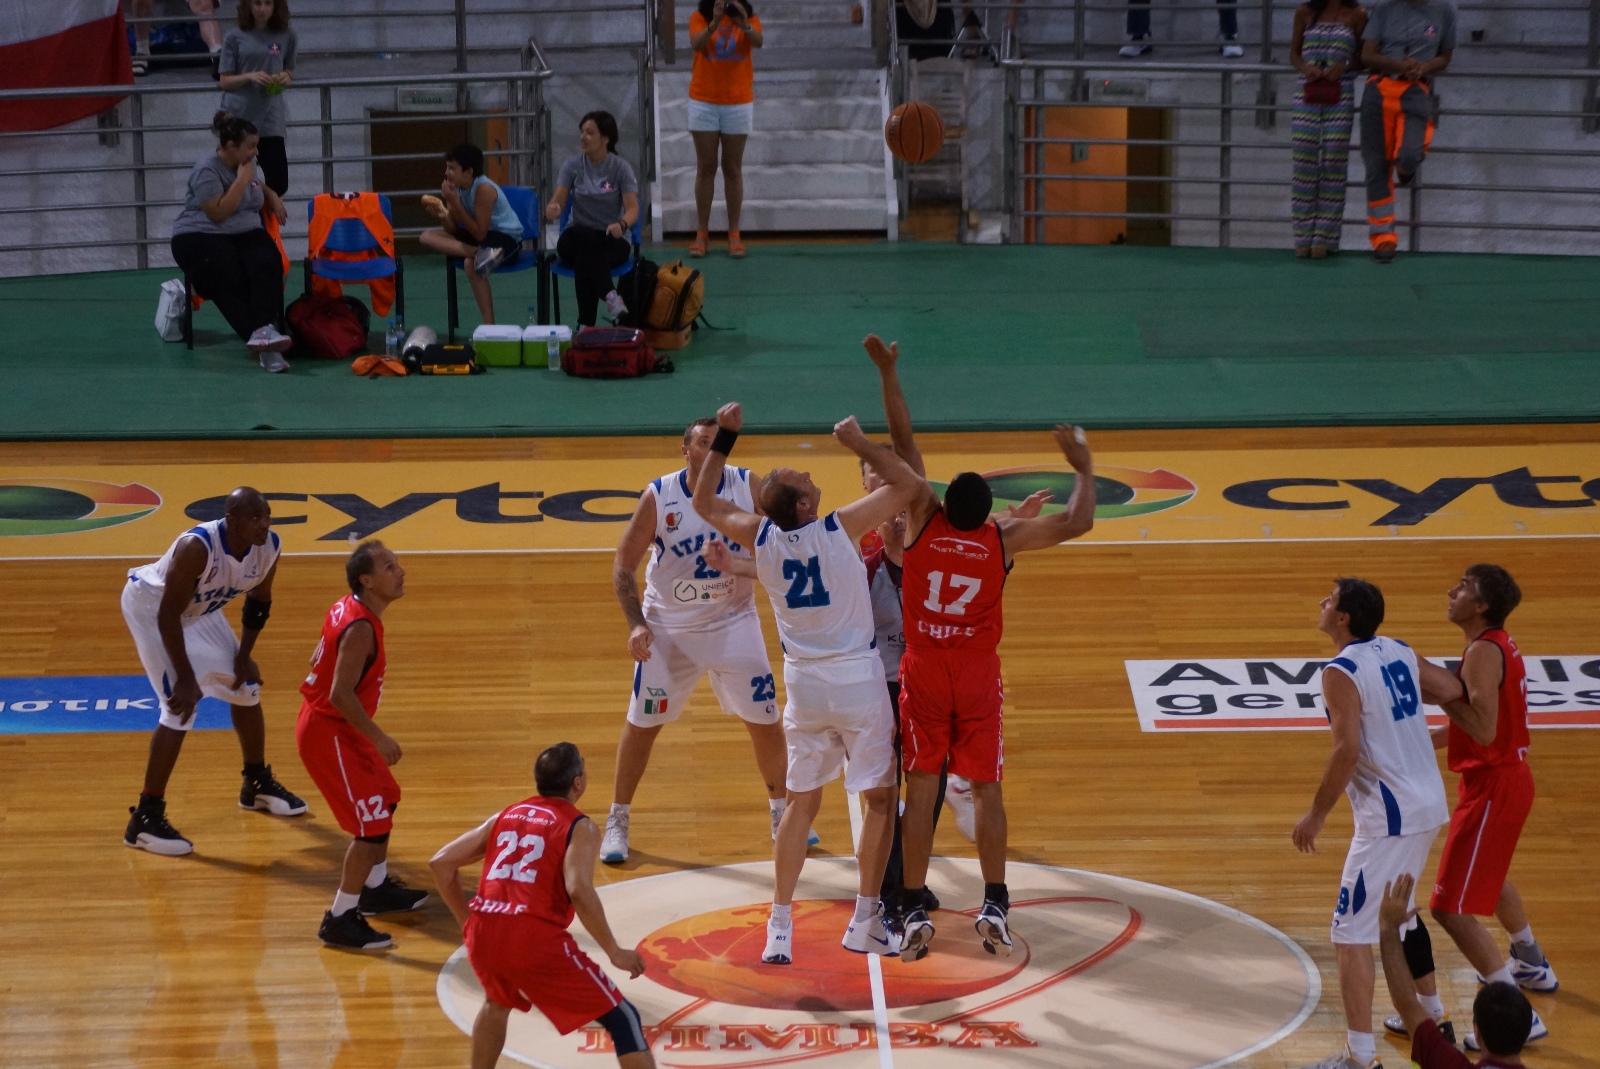 ALEXANDRION 1 | M45+ | 45 AÑOS CHILE - MASTER BASKET ITALIA